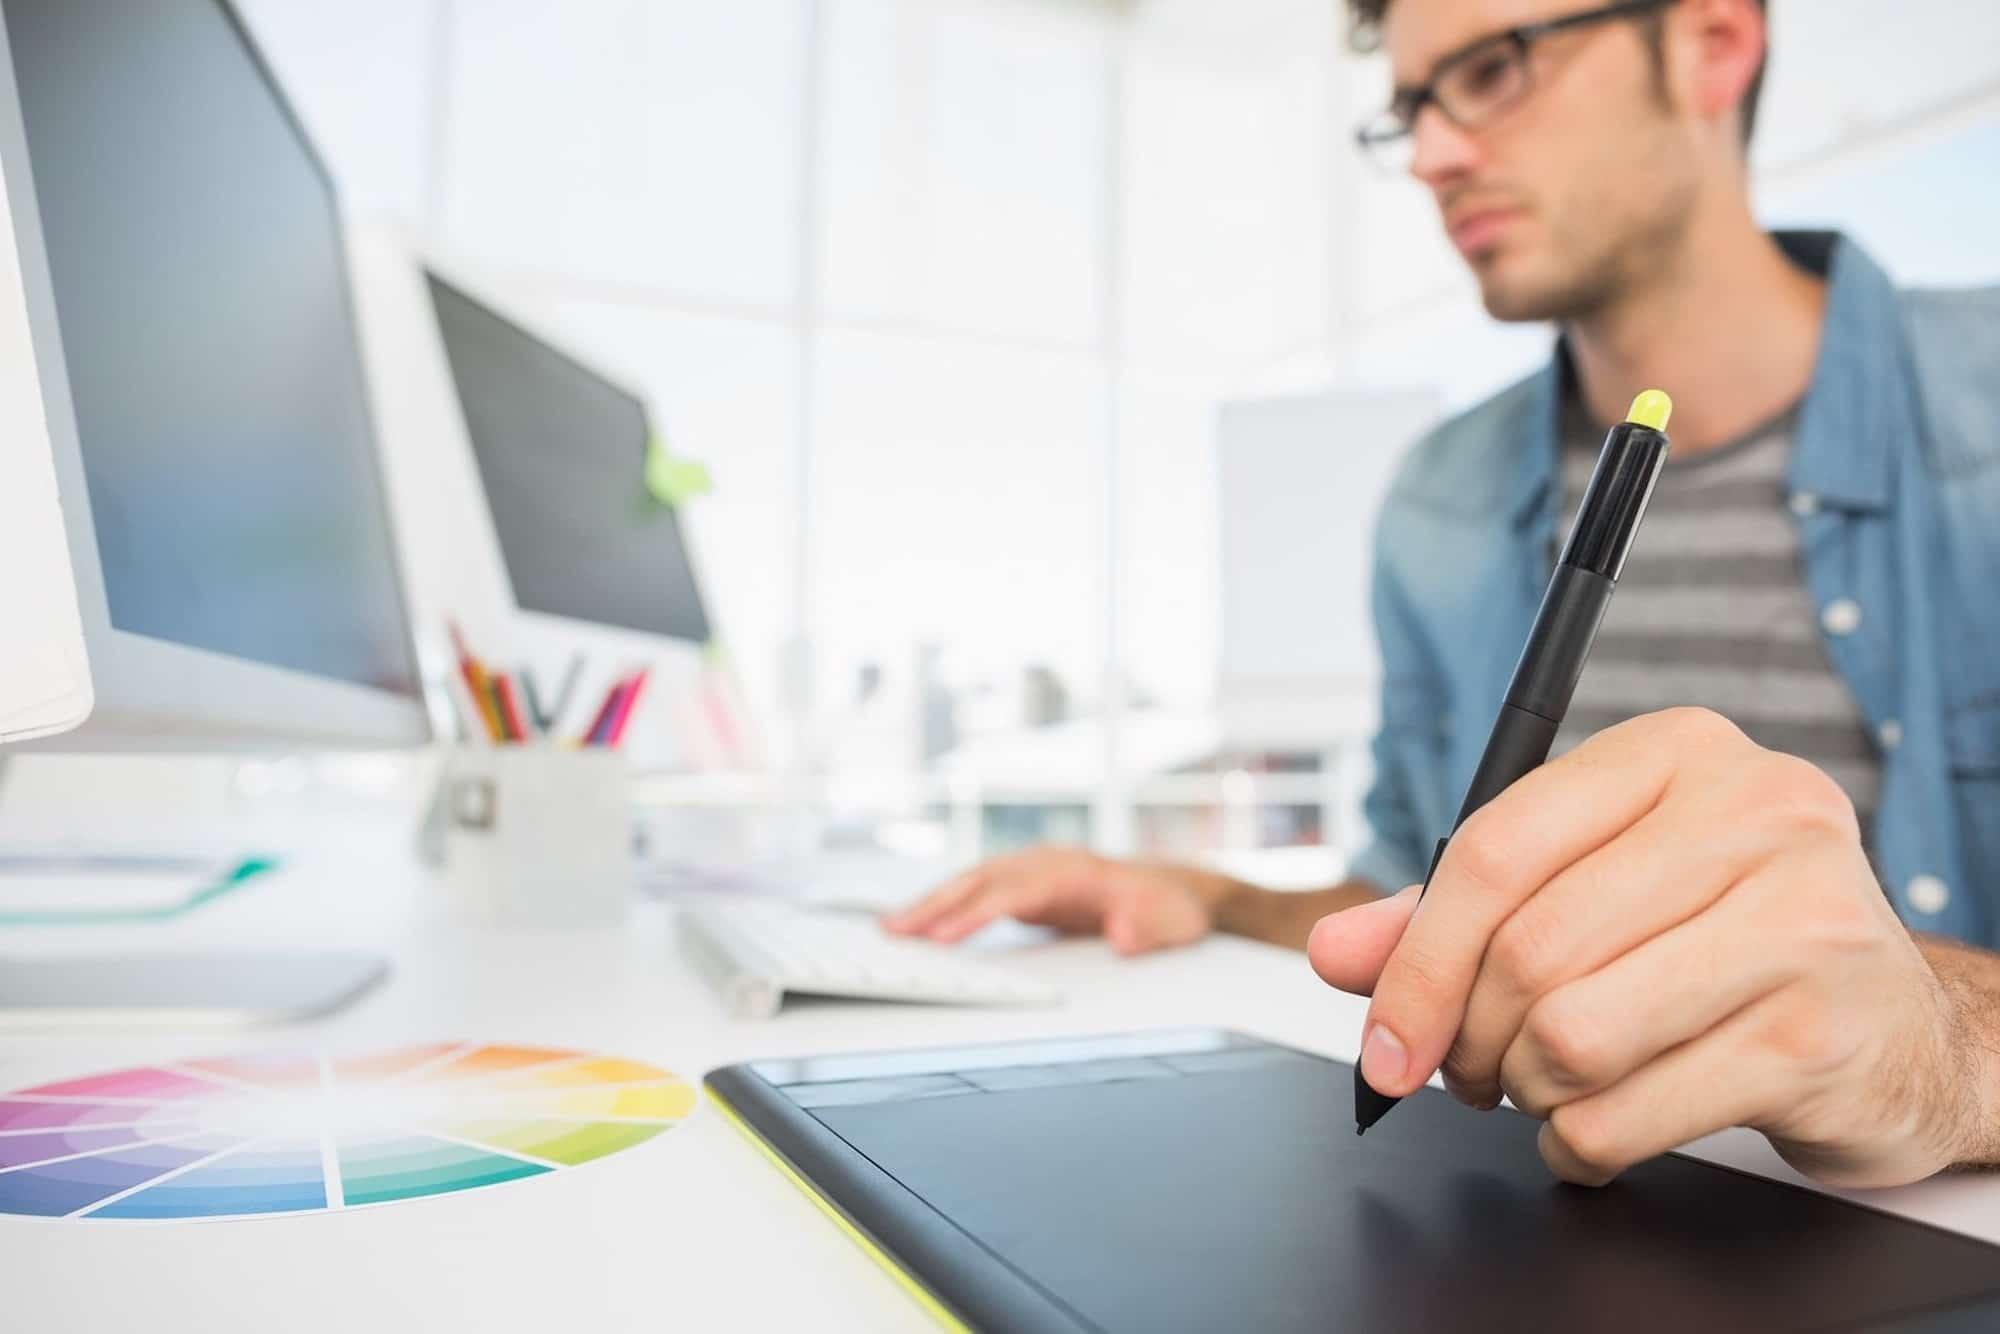 Australia joins European Union Intellectual Property Network DESIGNview